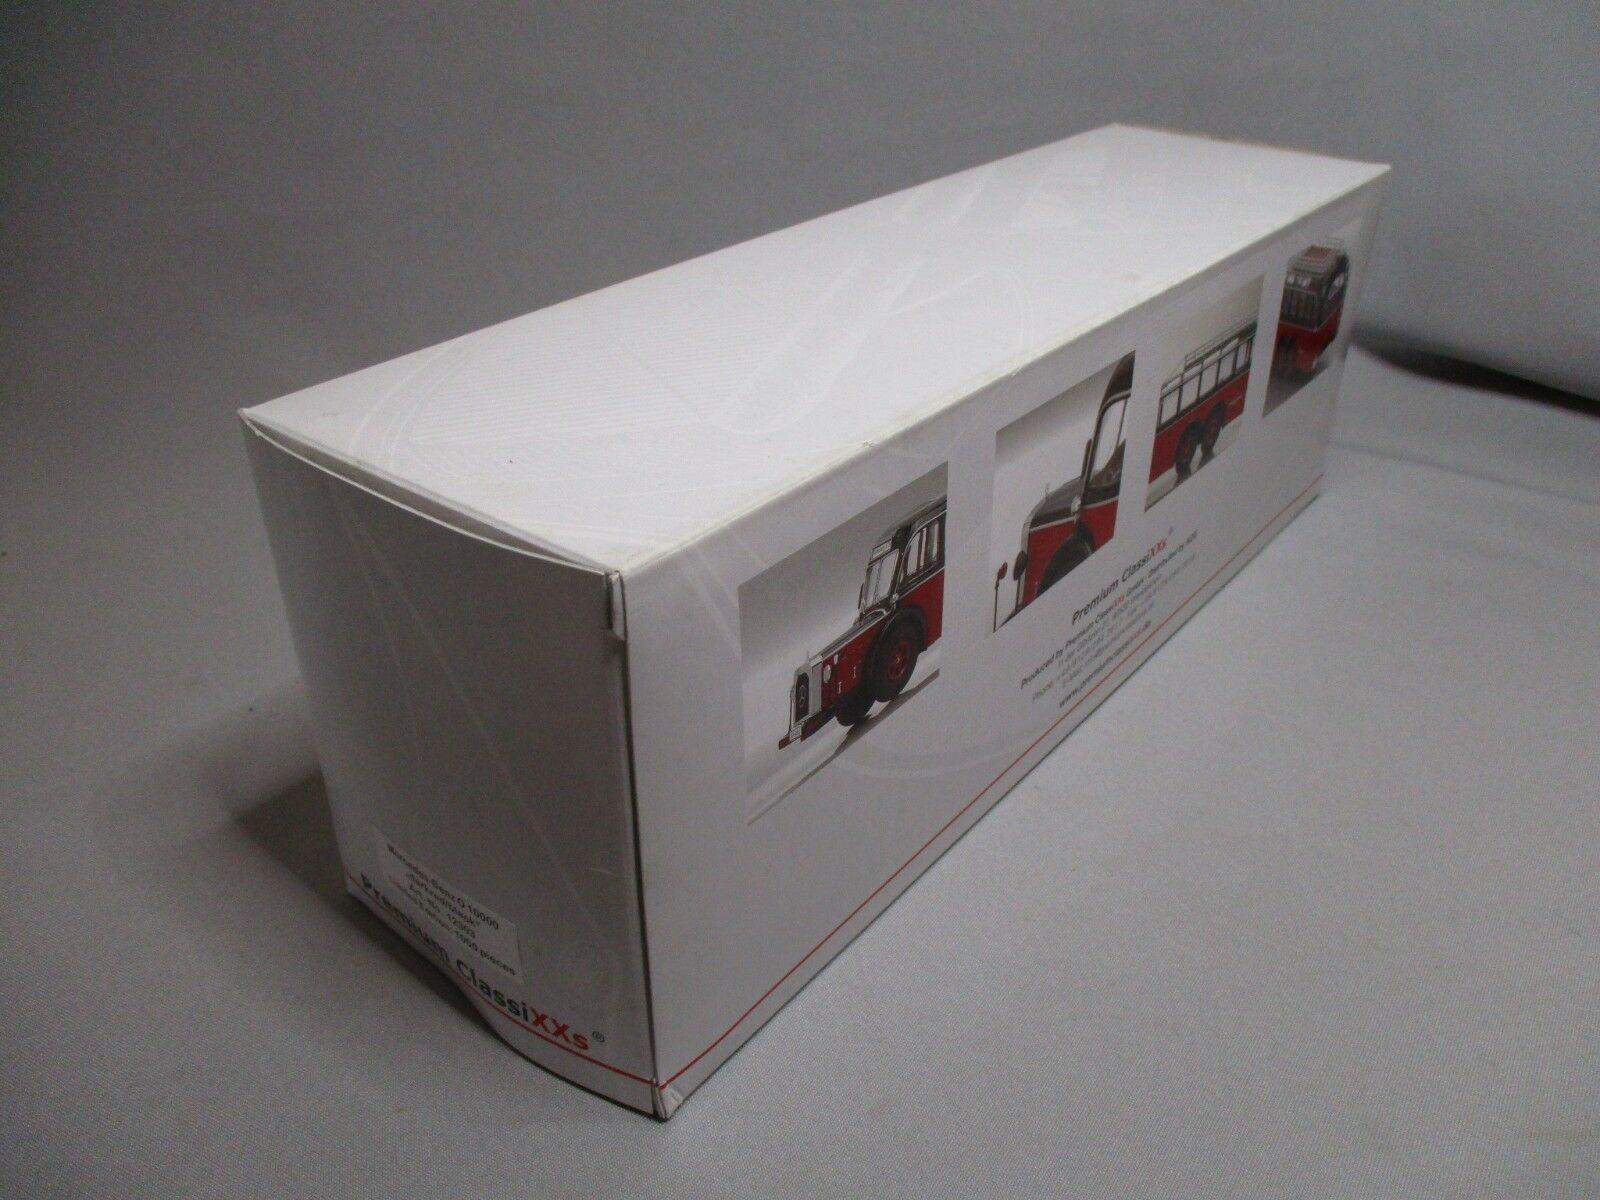 DV8295 DV8295 DV8295 PREMIUM classeIXXS 1 43 MERCEDES BENZ O 10000 nero Ref 12303 LTD 1000 P 0fab80